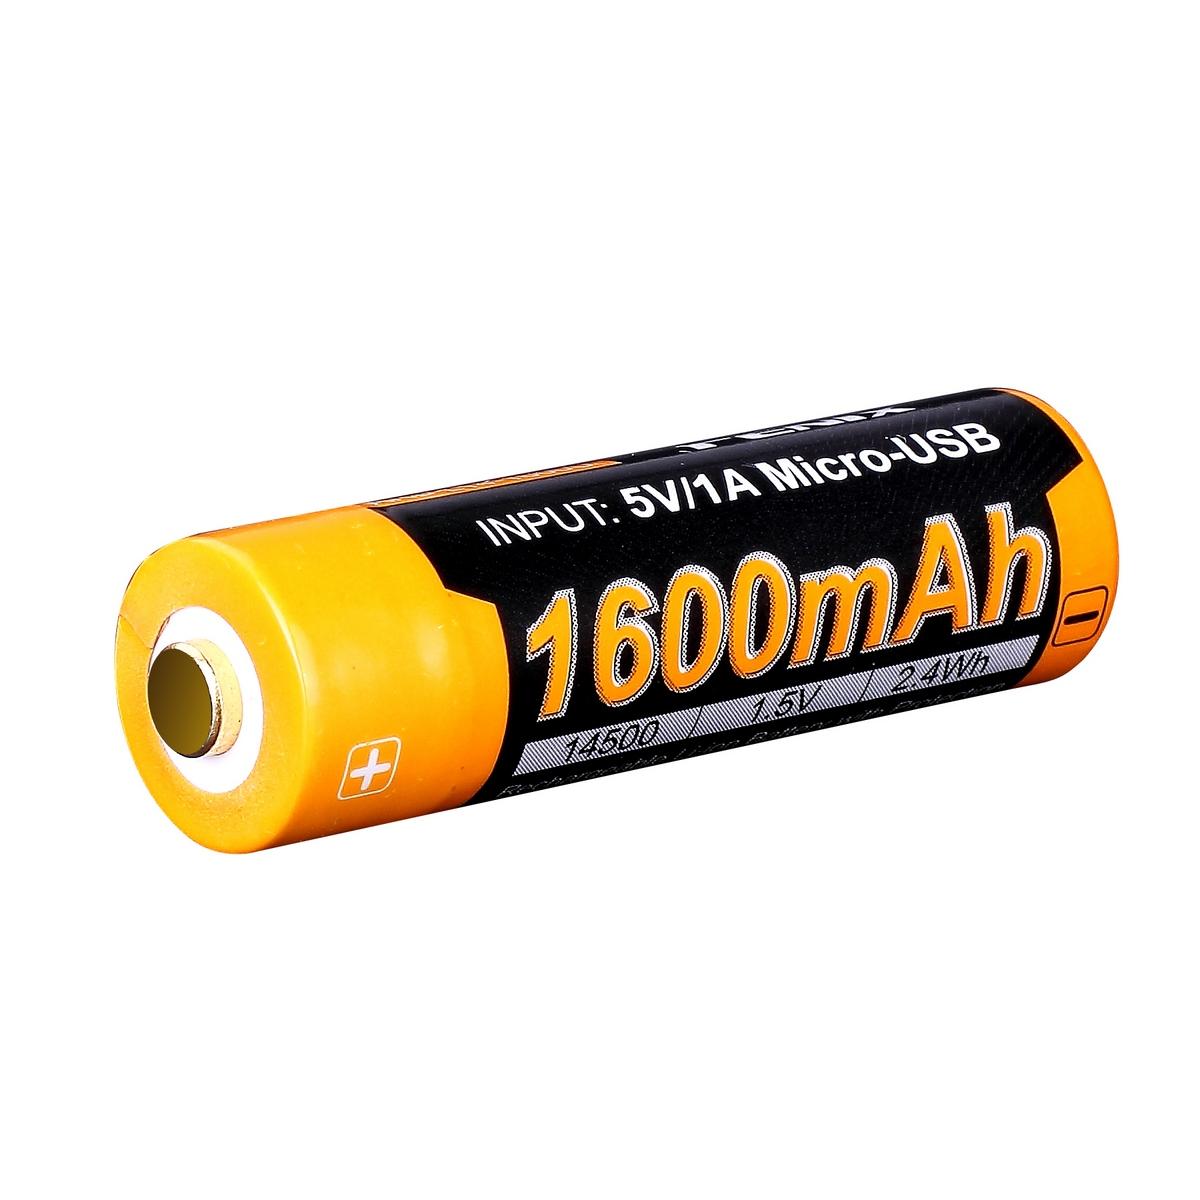 Аккумулятор 14500 Fenix 1600U mAh с разъемом для USB (+ Антисептик-спрей для рук в подарок!)